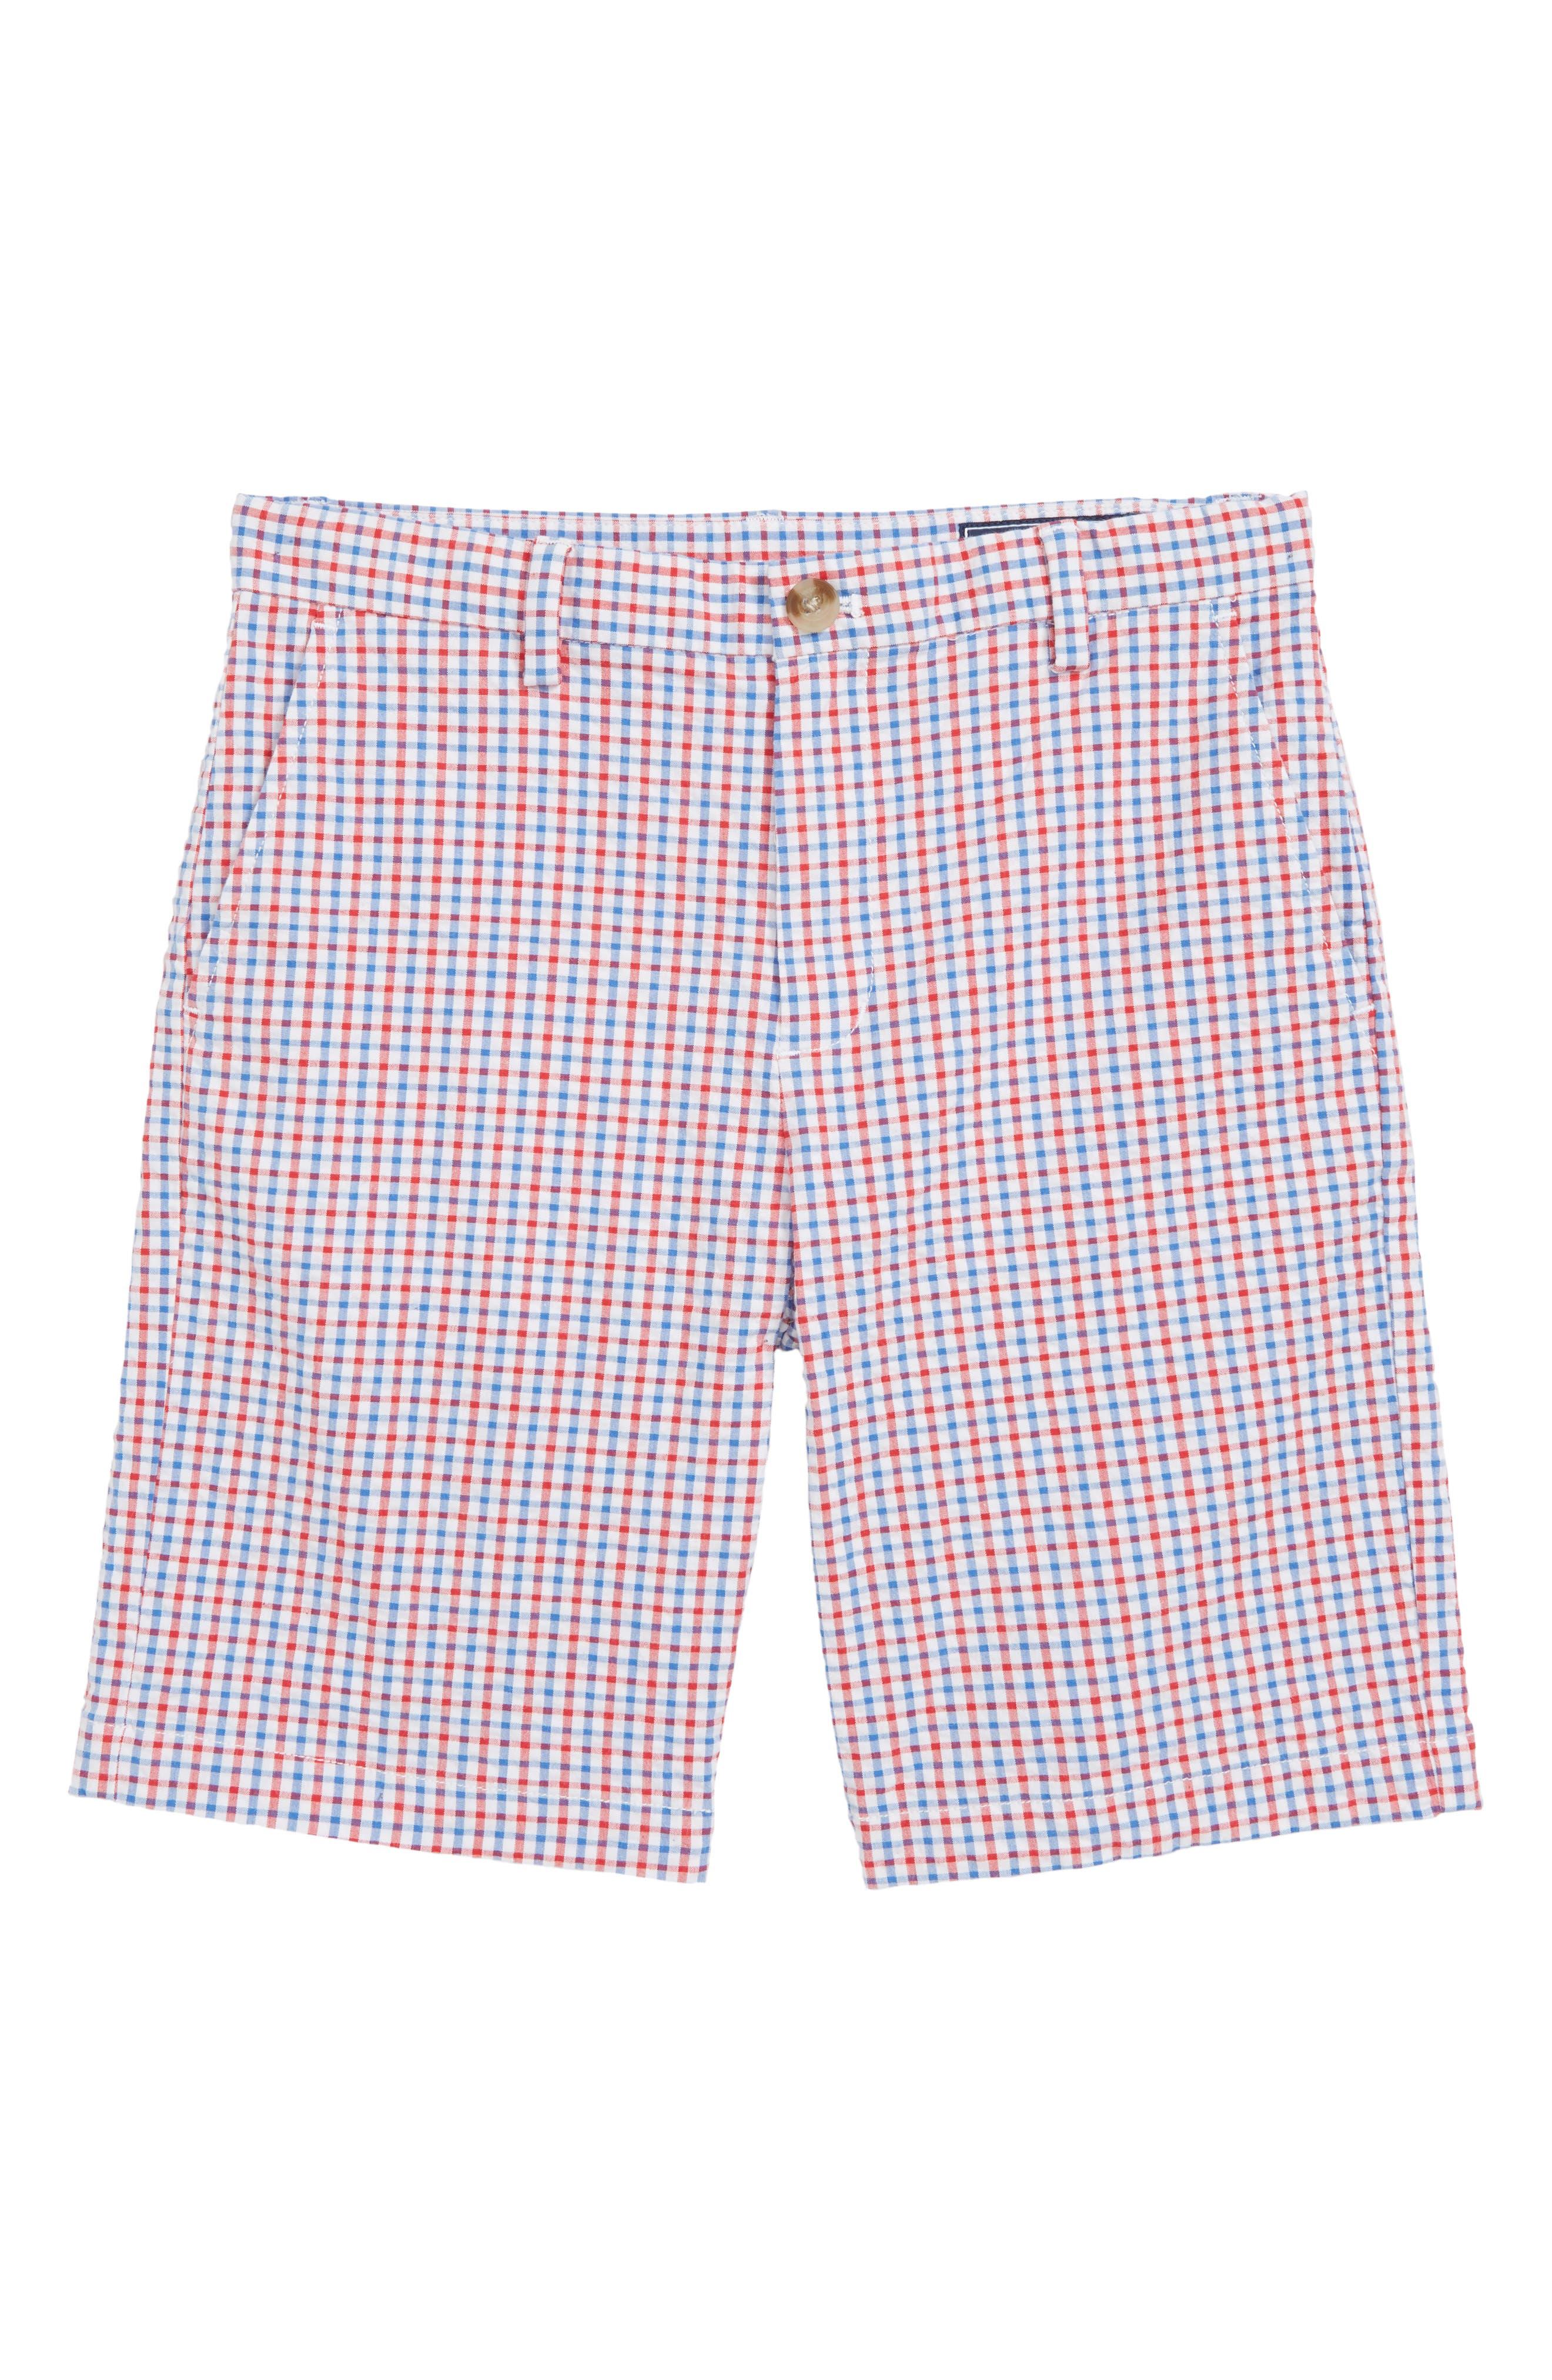 Gingham Seersucker Breaker Shorts,                         Main,                         color, SPINNAKER